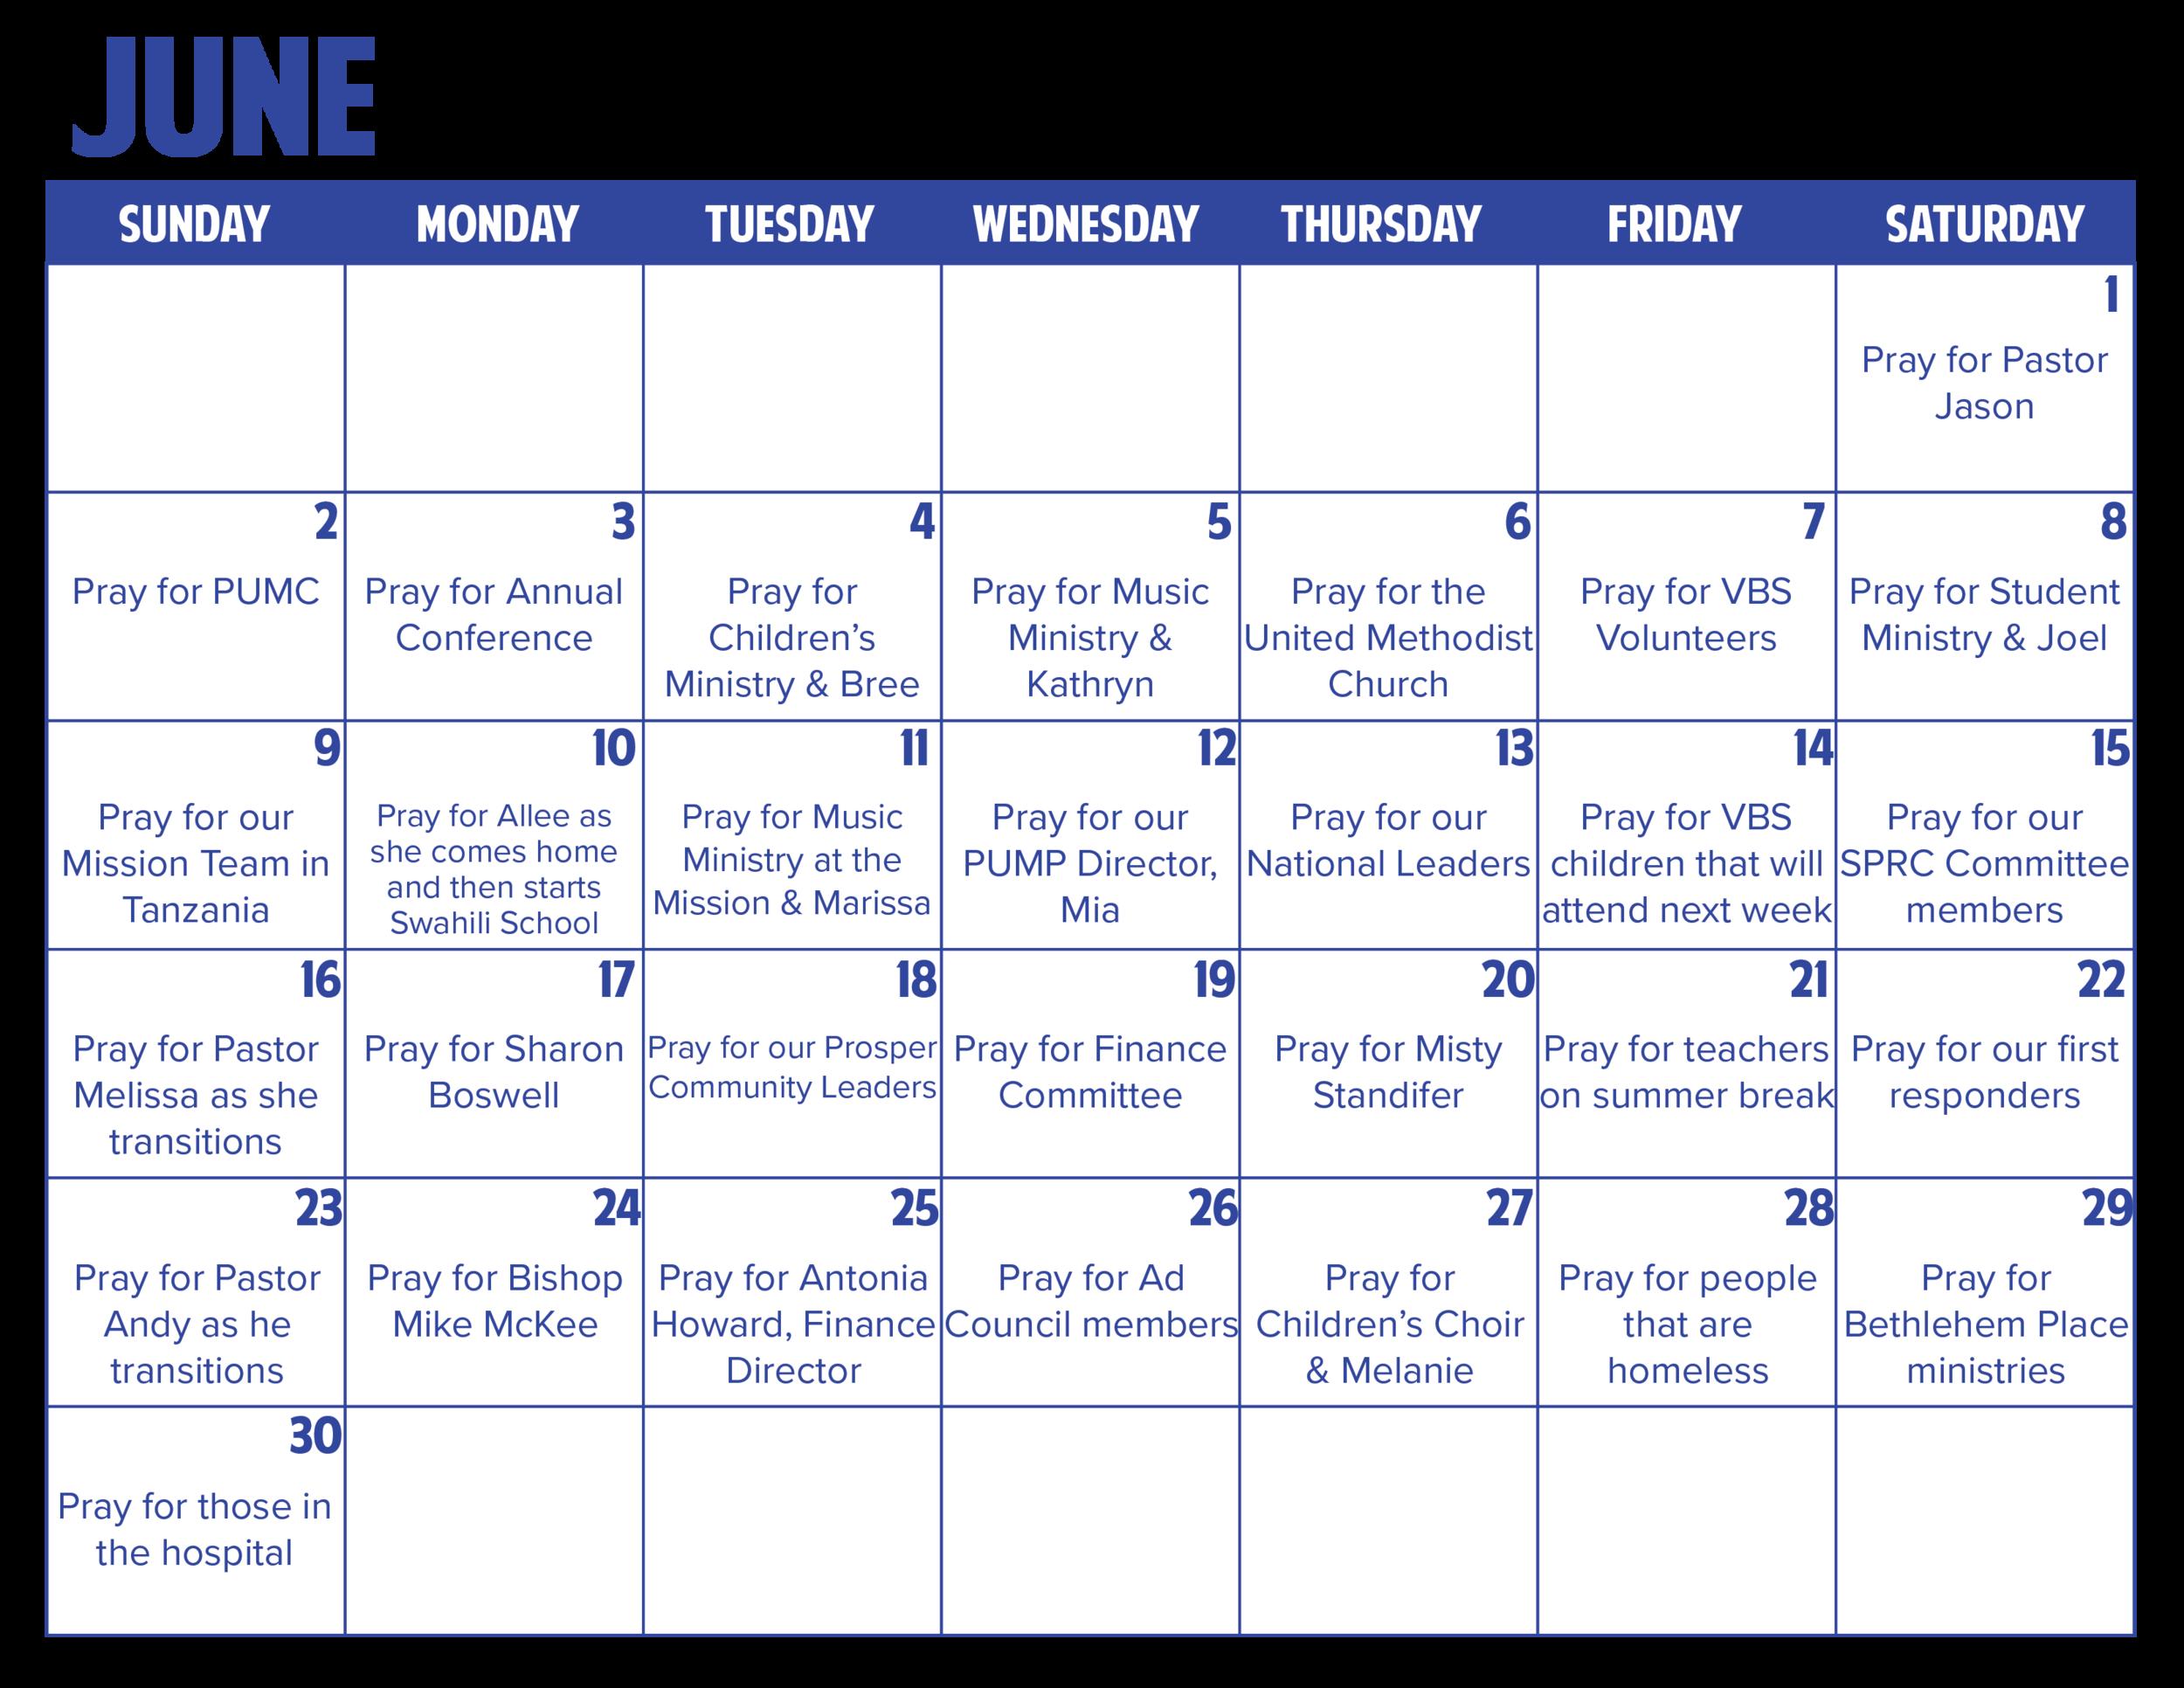 Prayer Calendar - June 2019-01.png